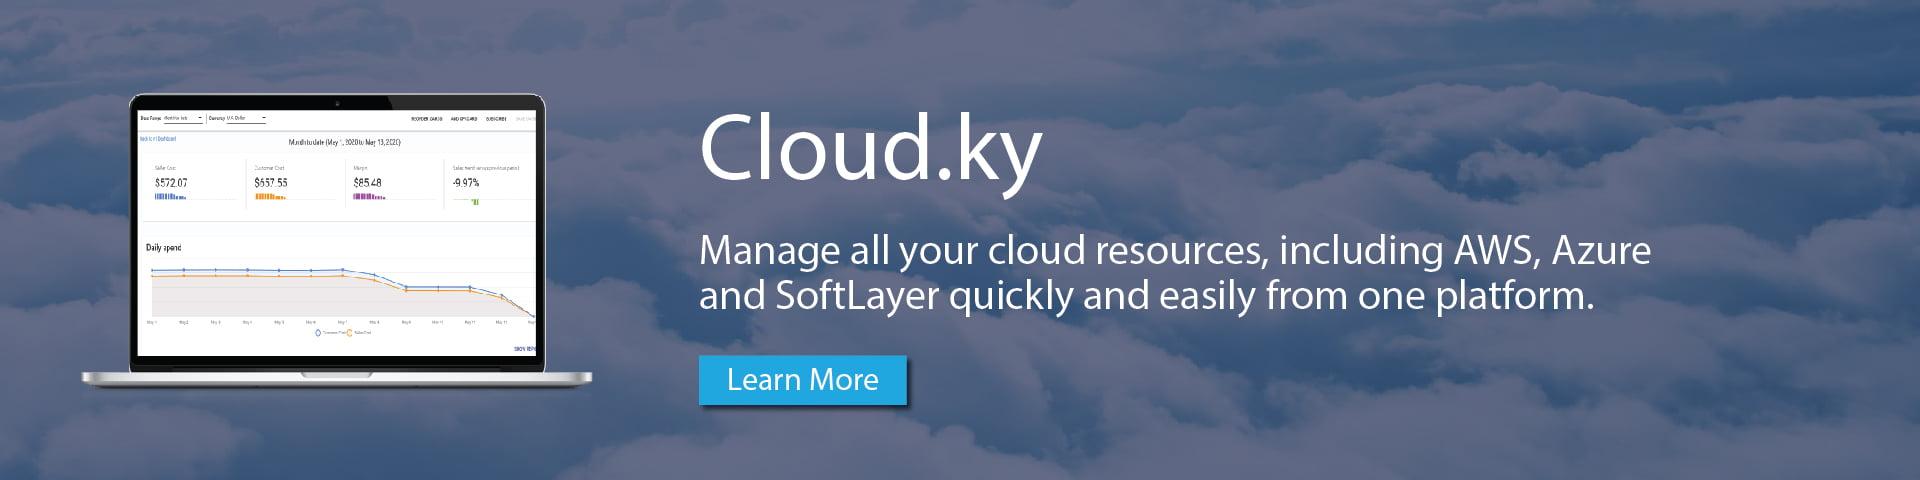 Cloud-Banner_1920x480-01-01